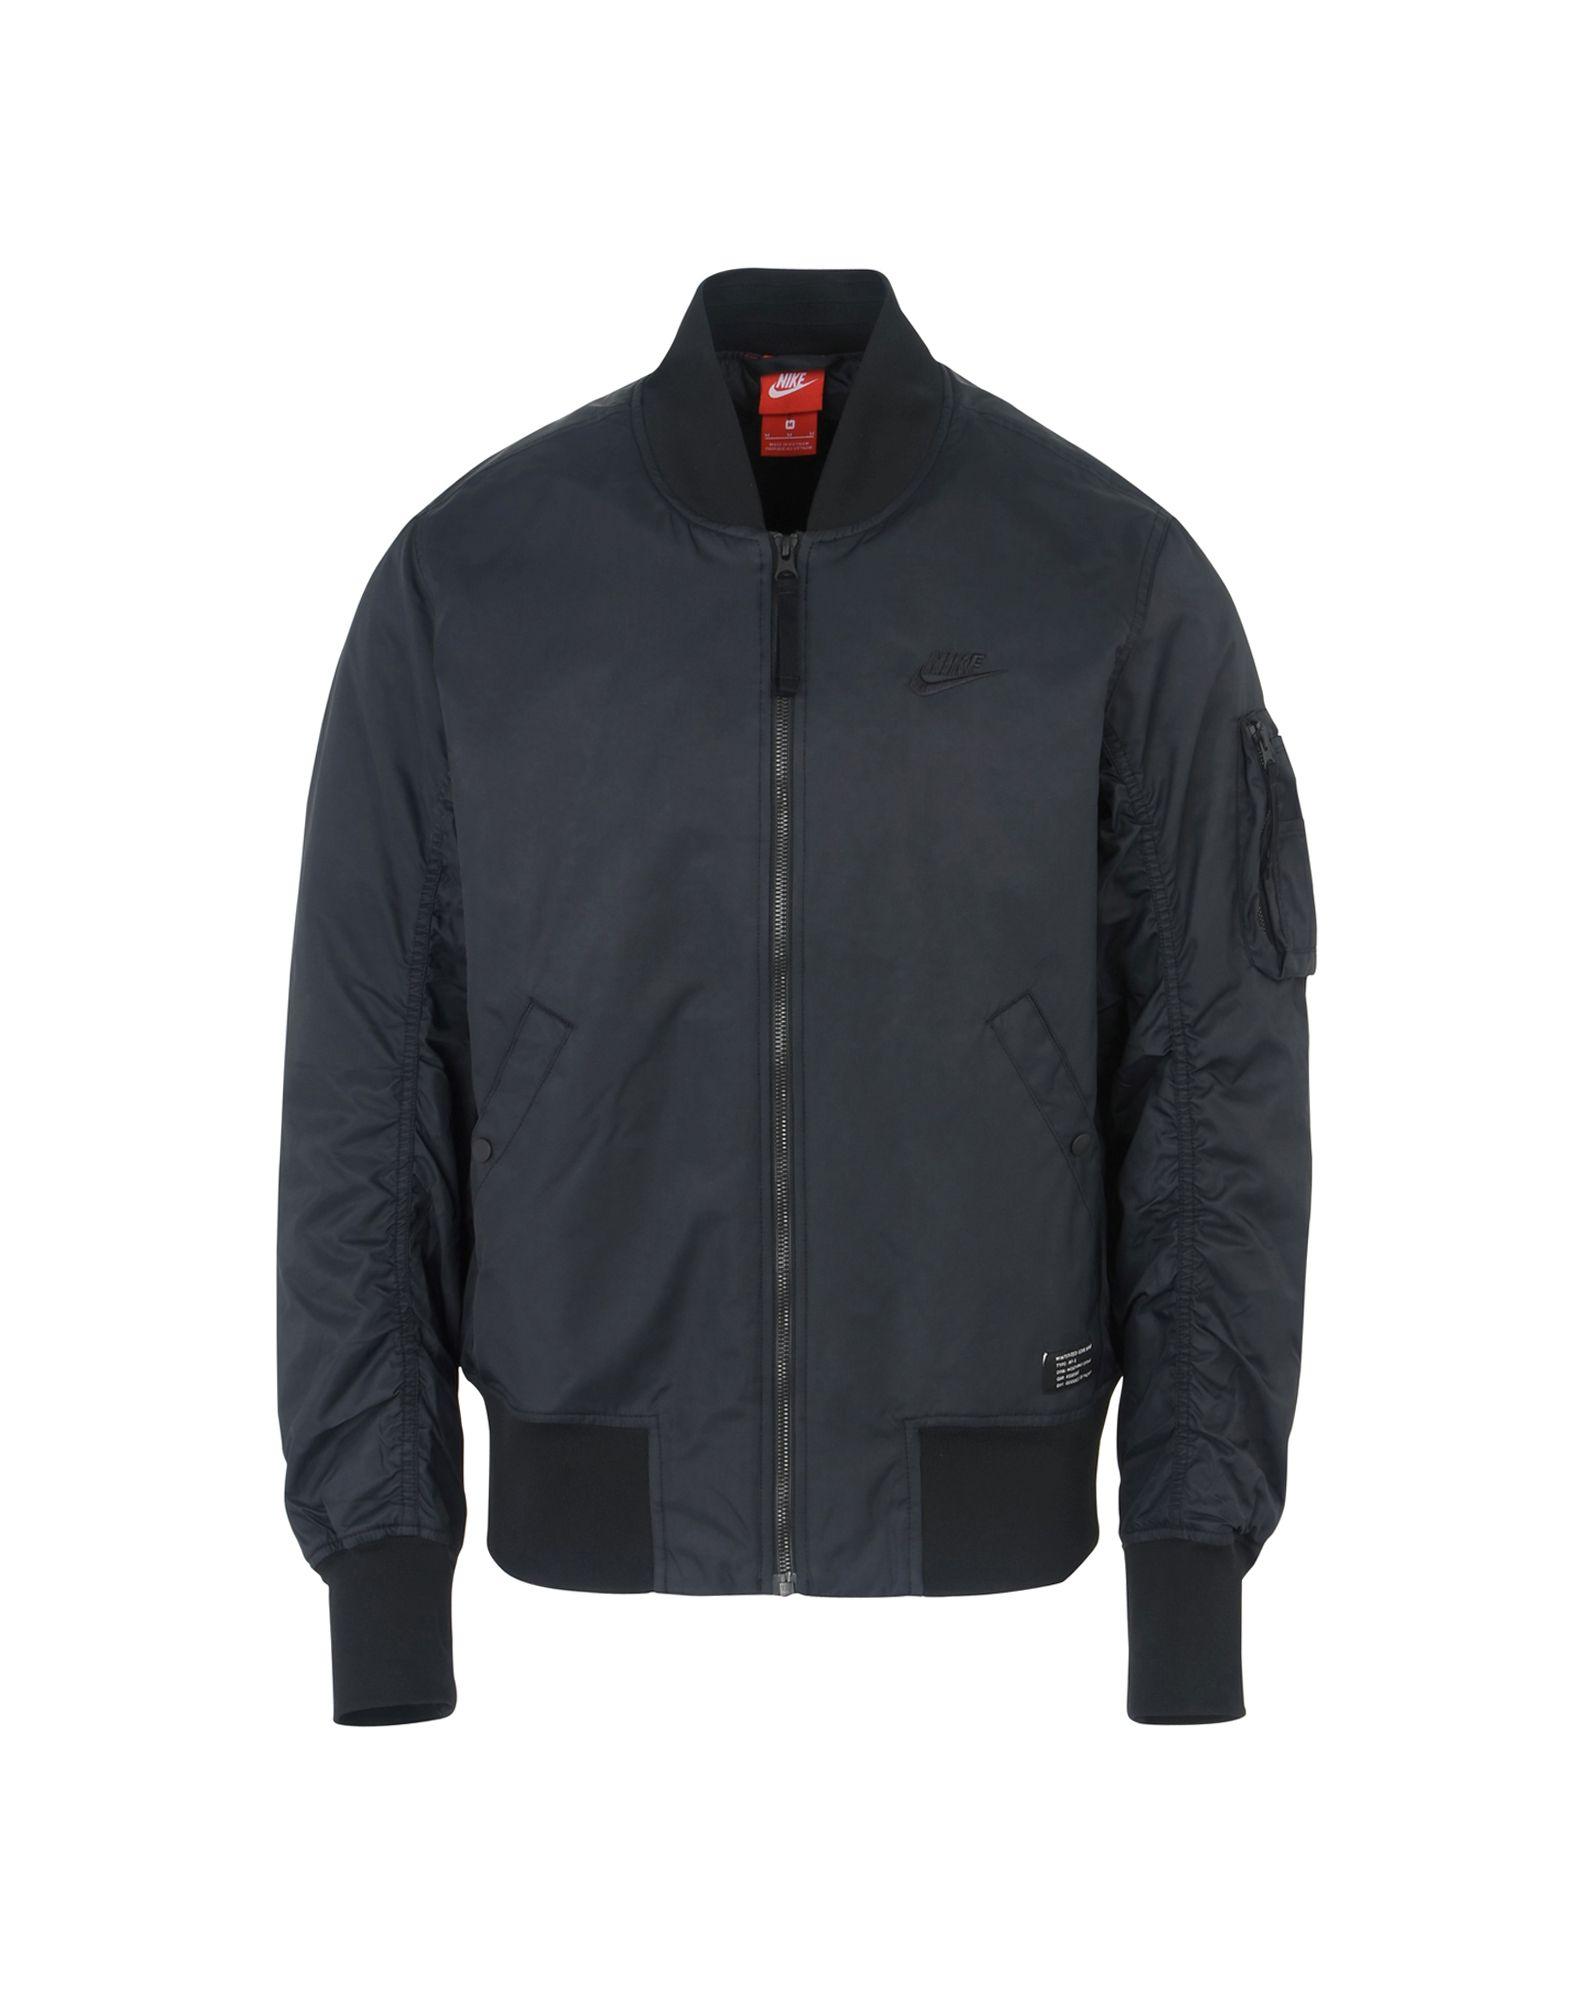 Bomber Nike Jacket Woven Af1 - Uomo - Acquista online su